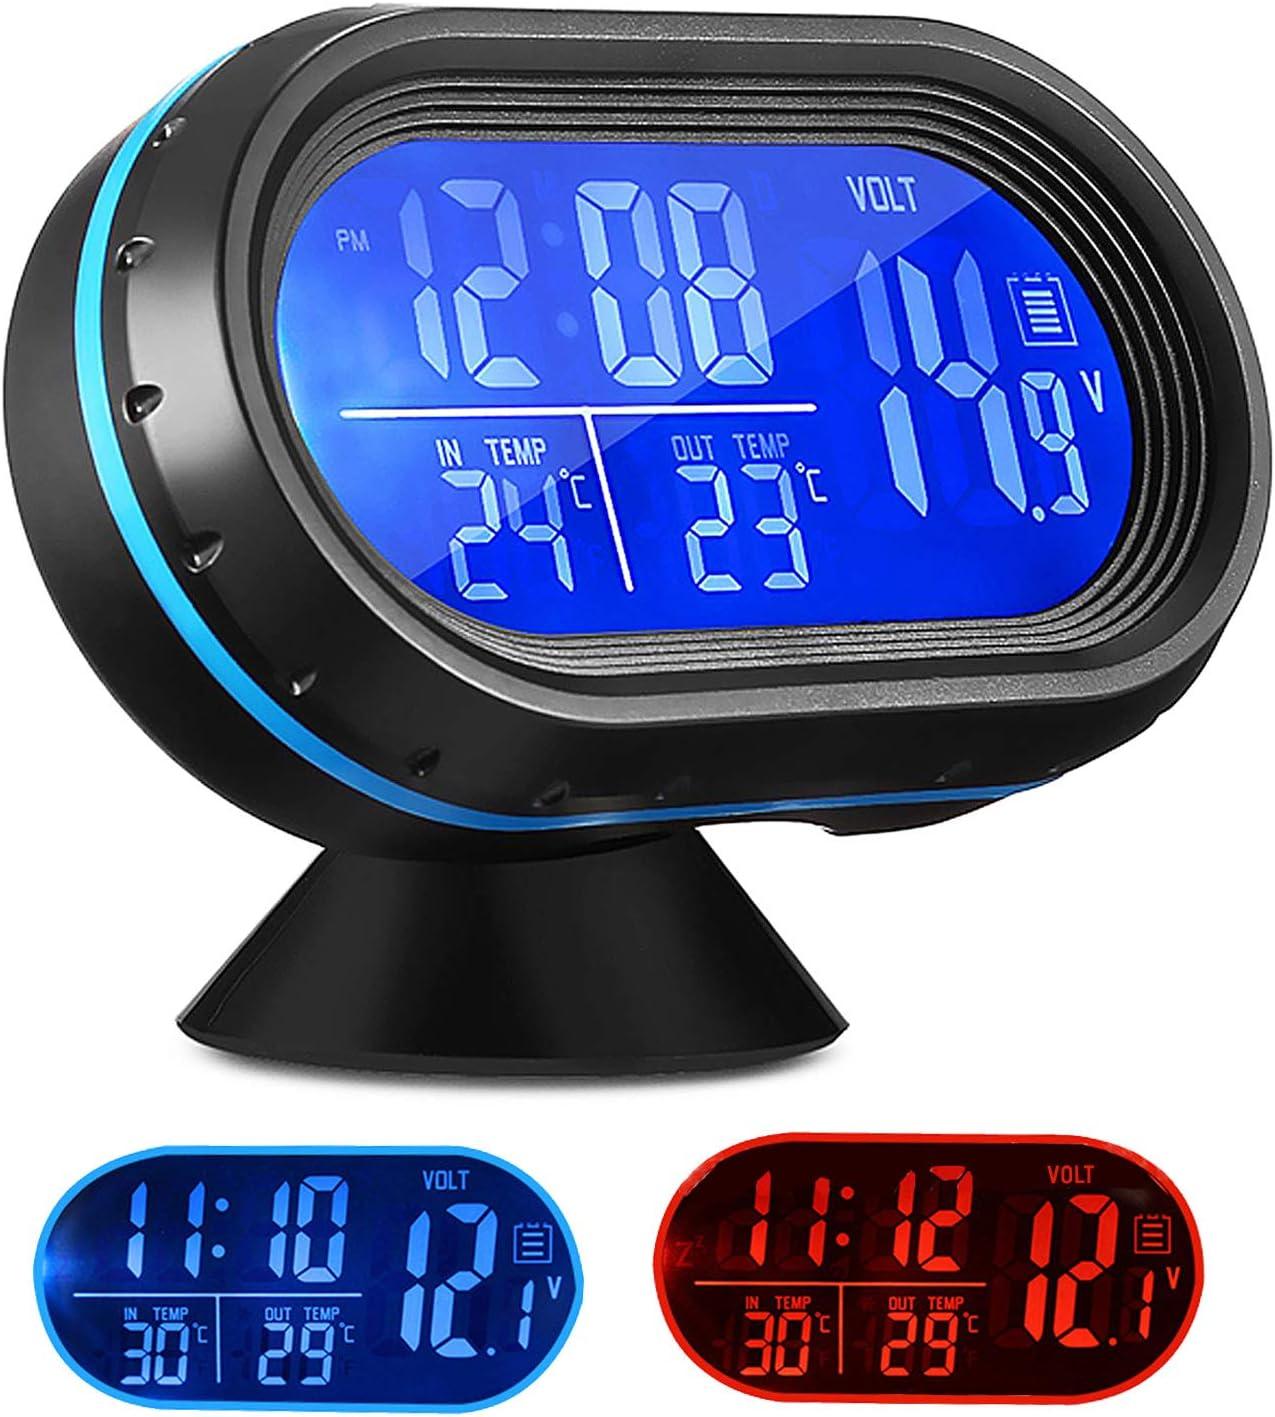 YTDTKJ VST 7009V Multi-Functional Smart Digital Vehicular Clock Car Digital Clock with Thermometer and Automotive Voltmeter and Backlight